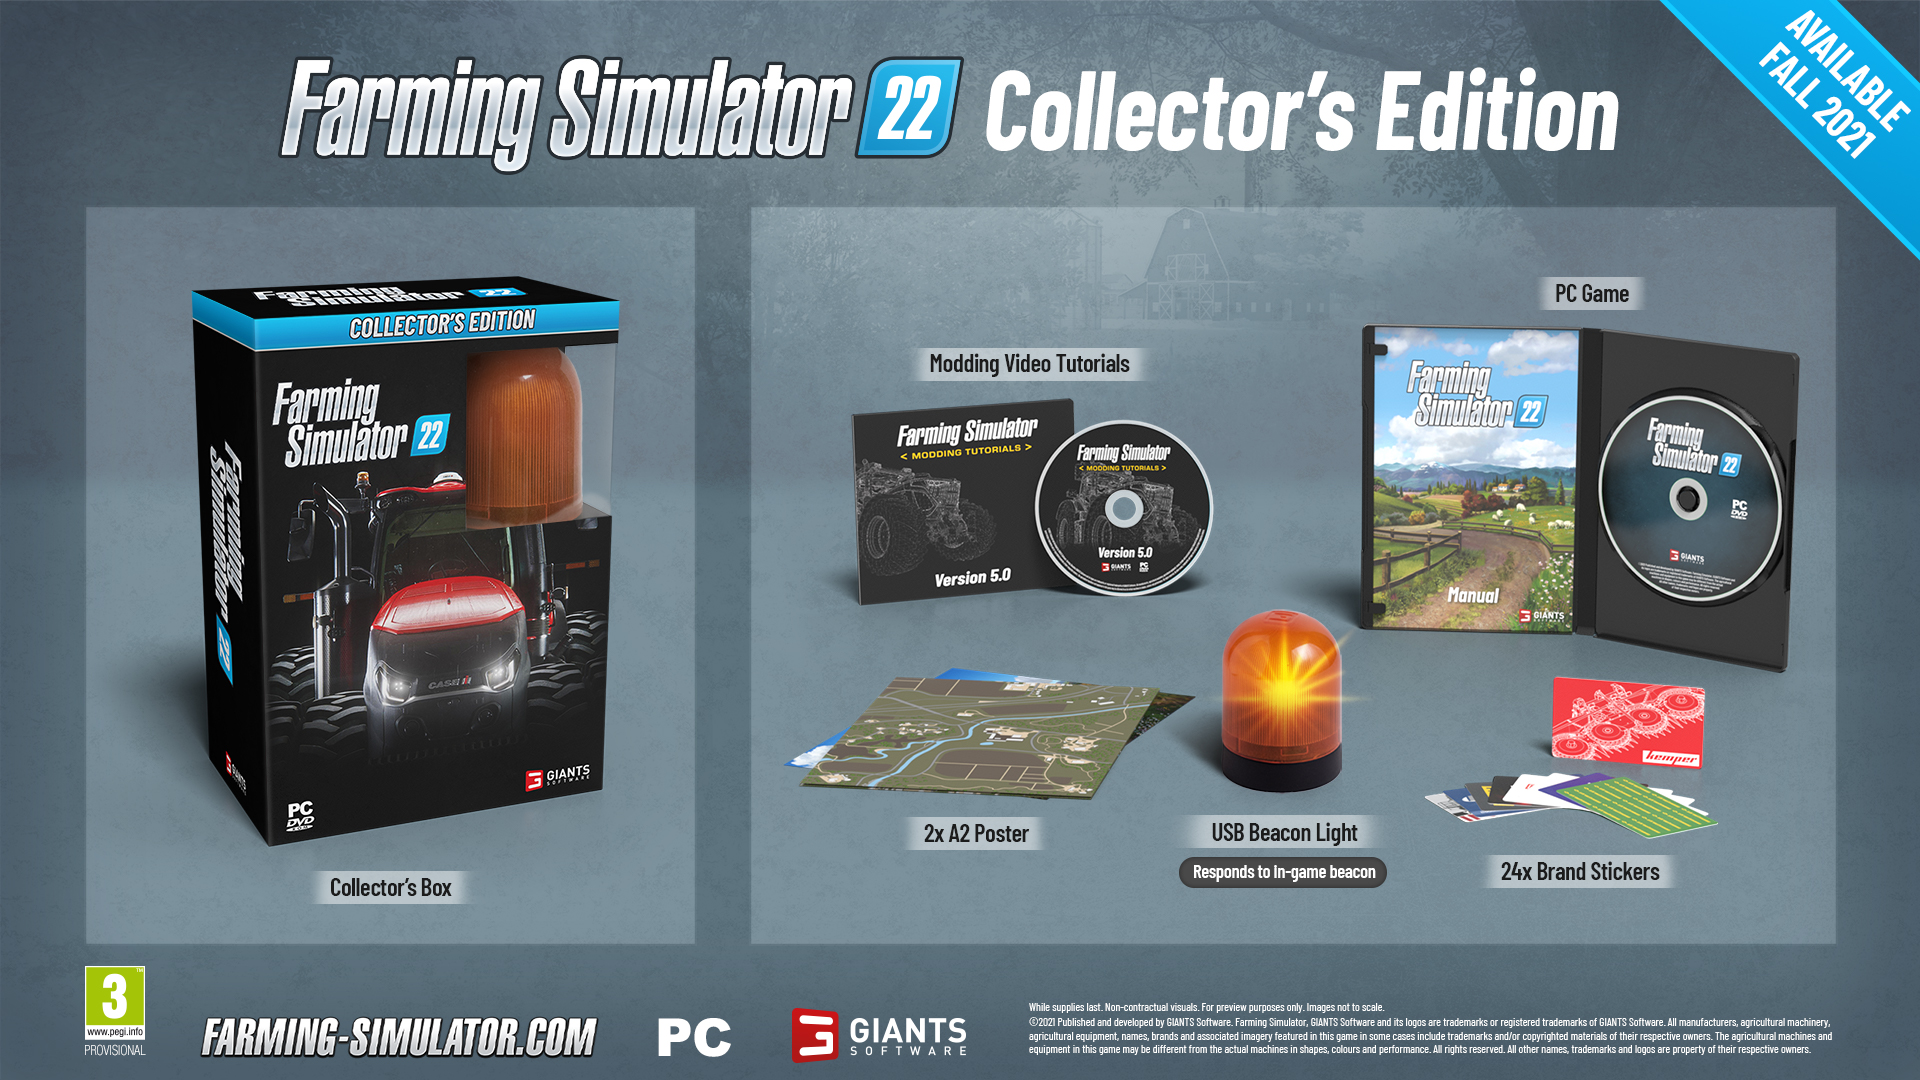 Farming Simulator 22 Collector s Edition